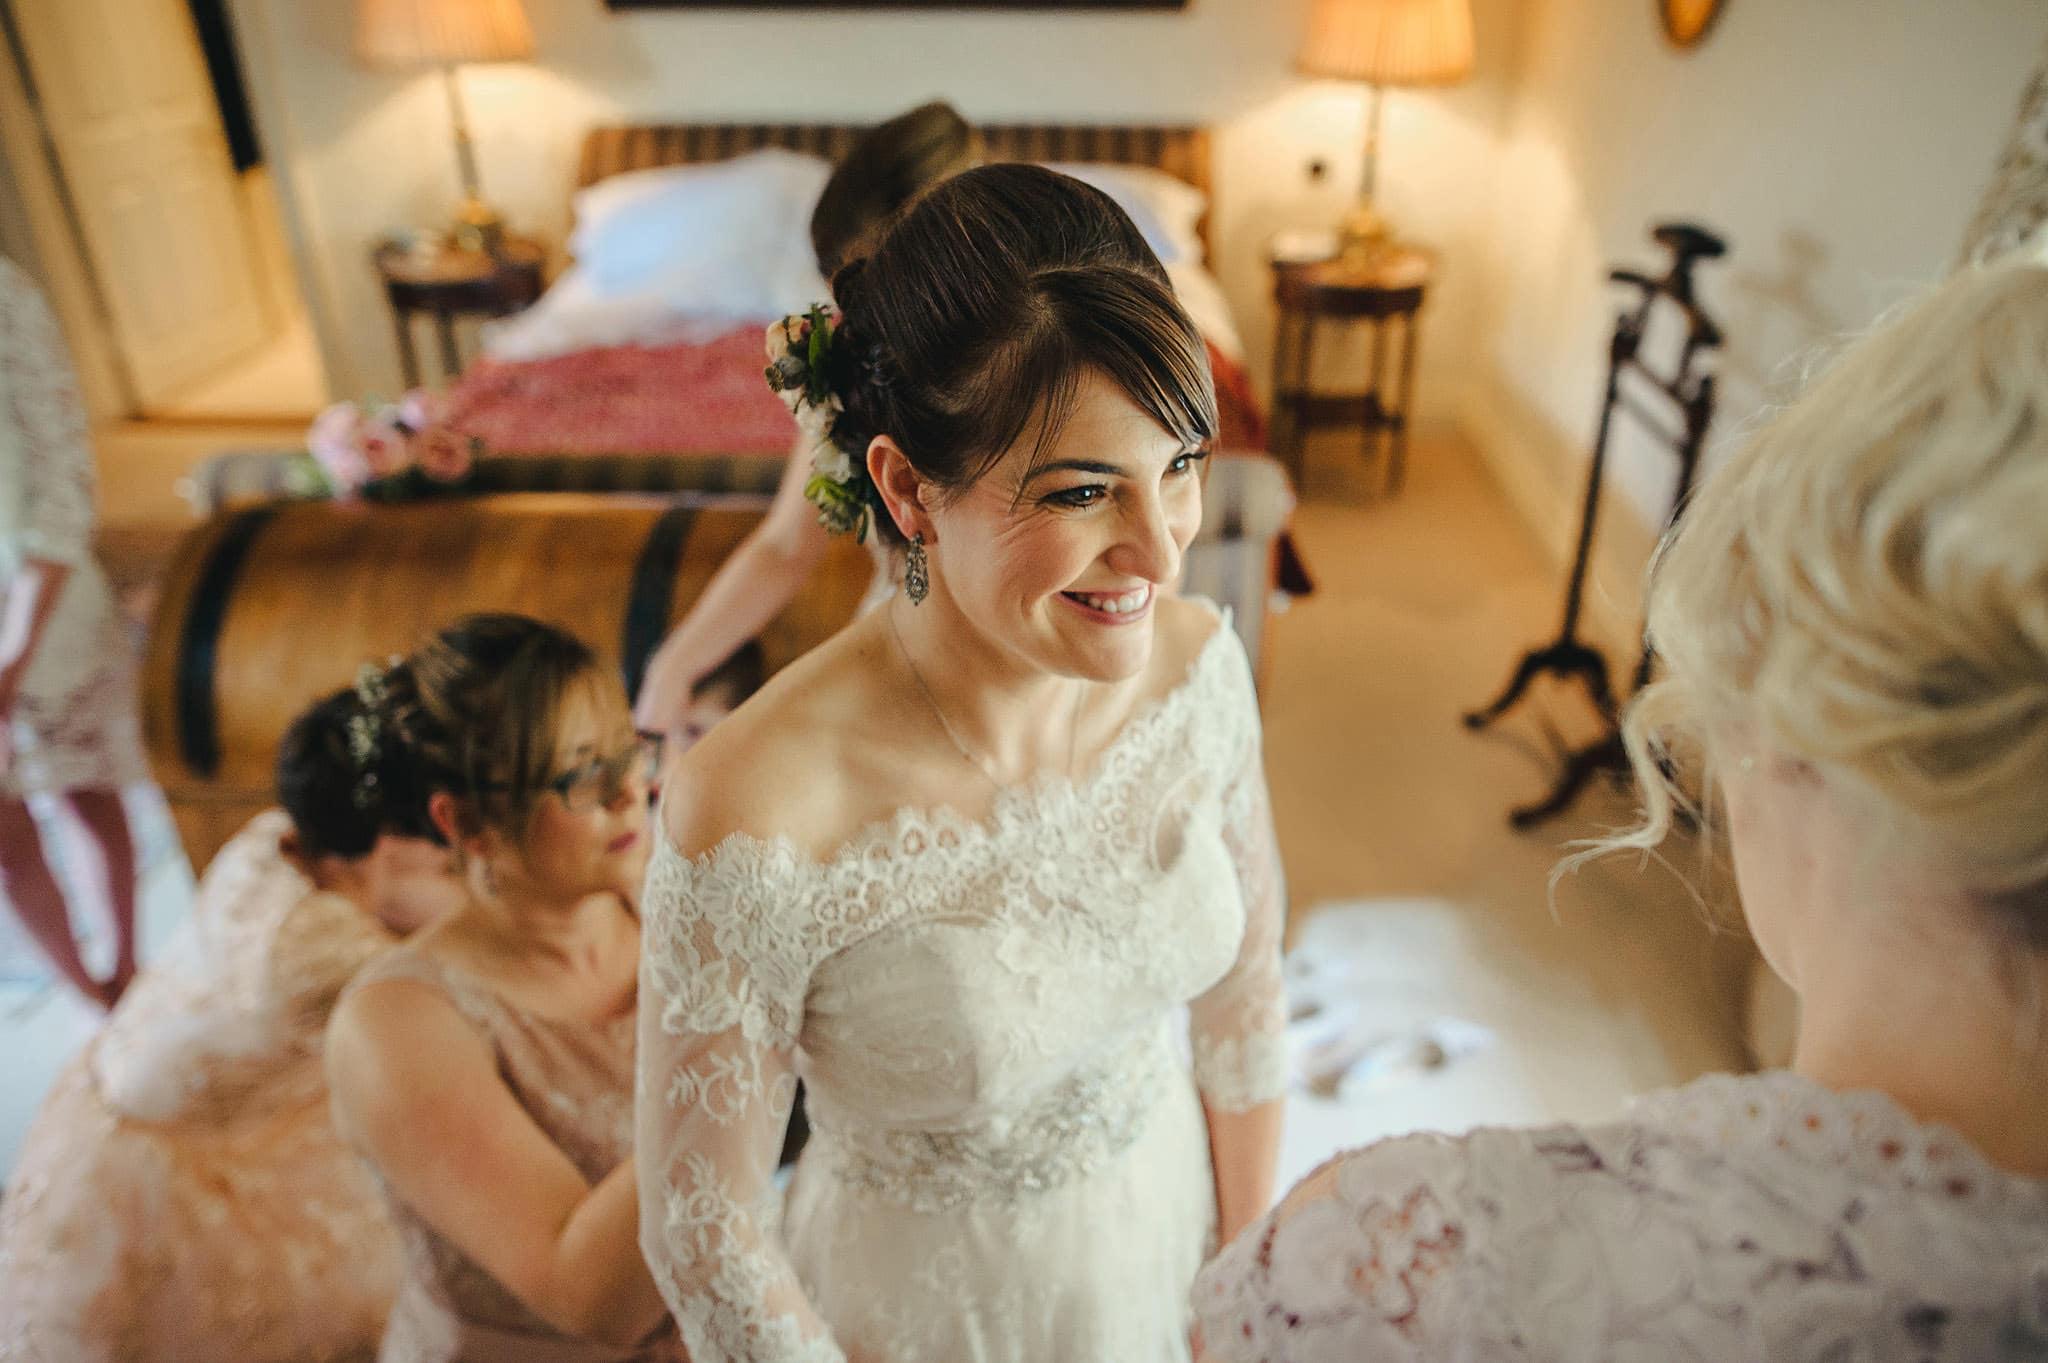 Dewsall Court wedding photography Herefordshire | Laura + Alex 27